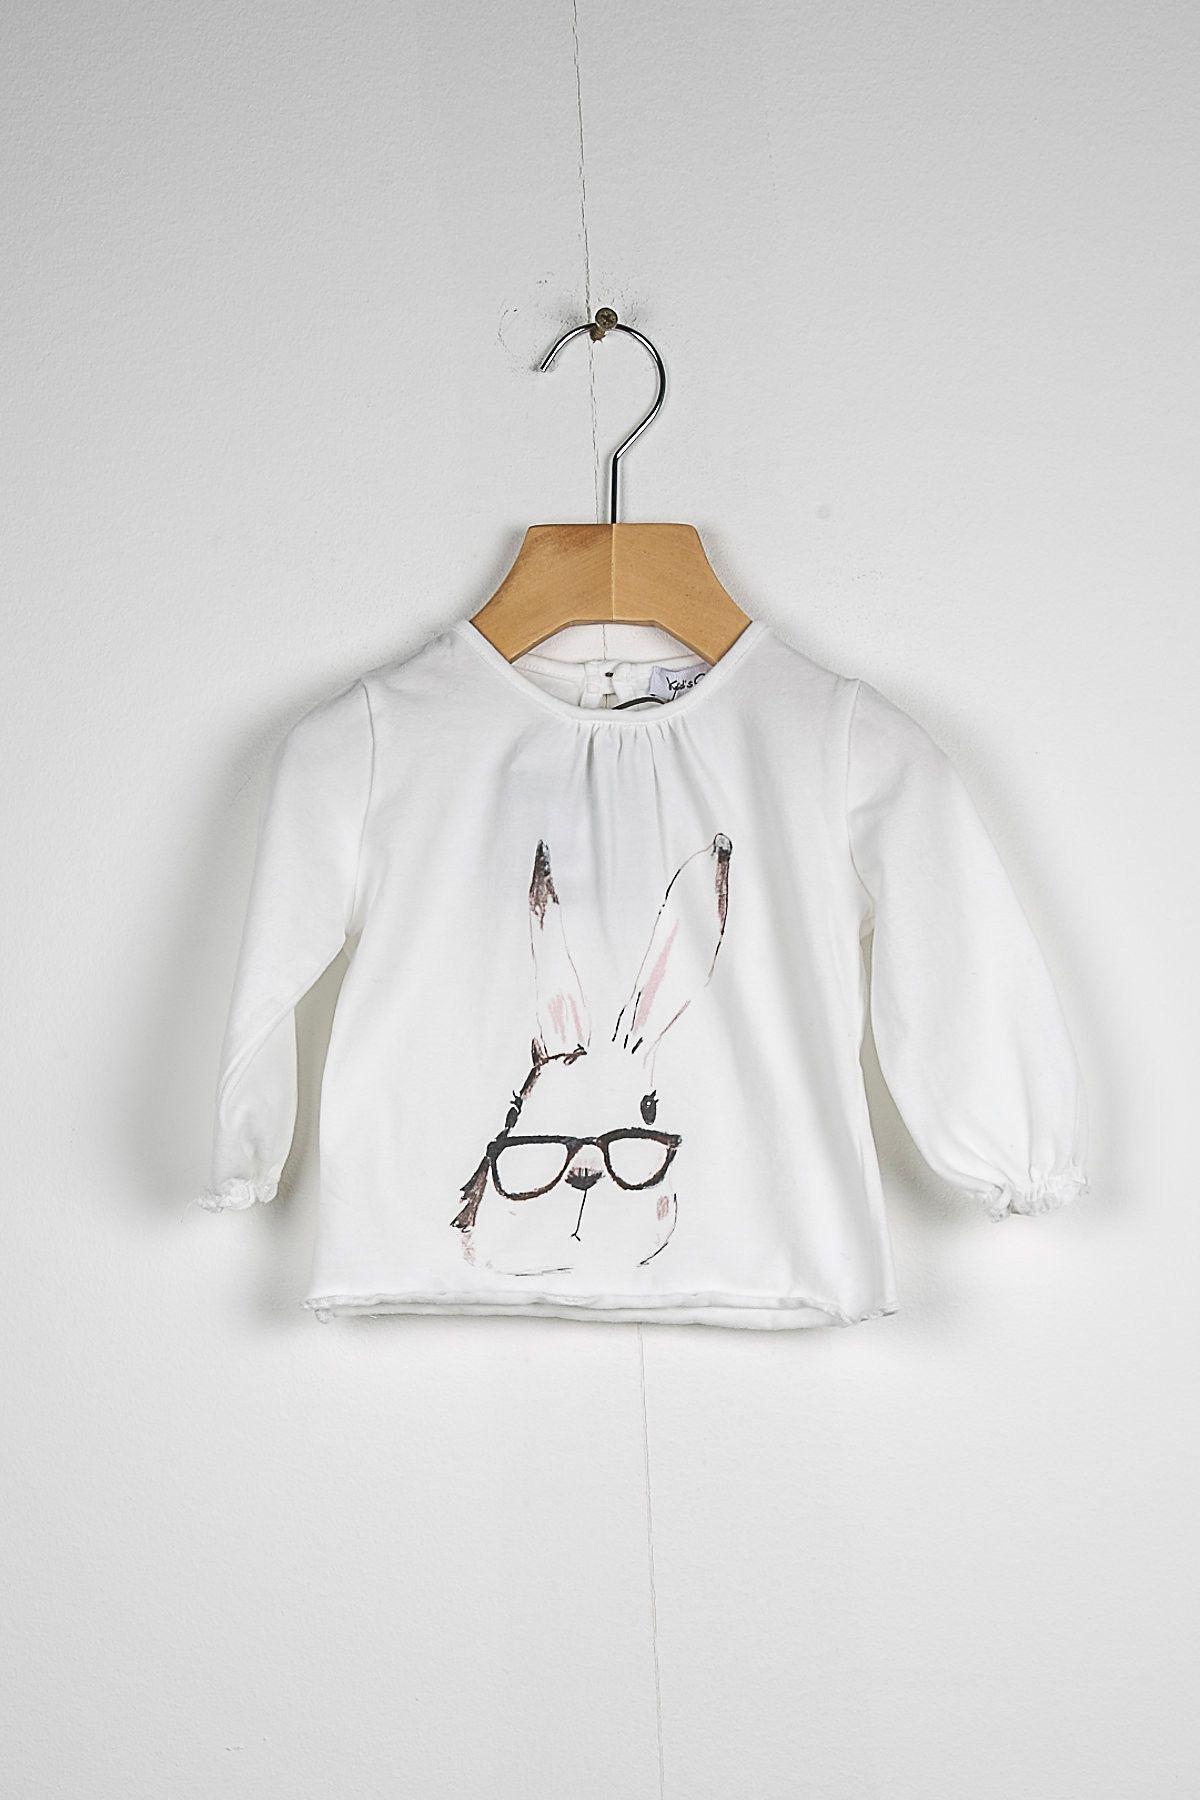 T-shirt stampa coniglio KID'S COMPANY 72K1869